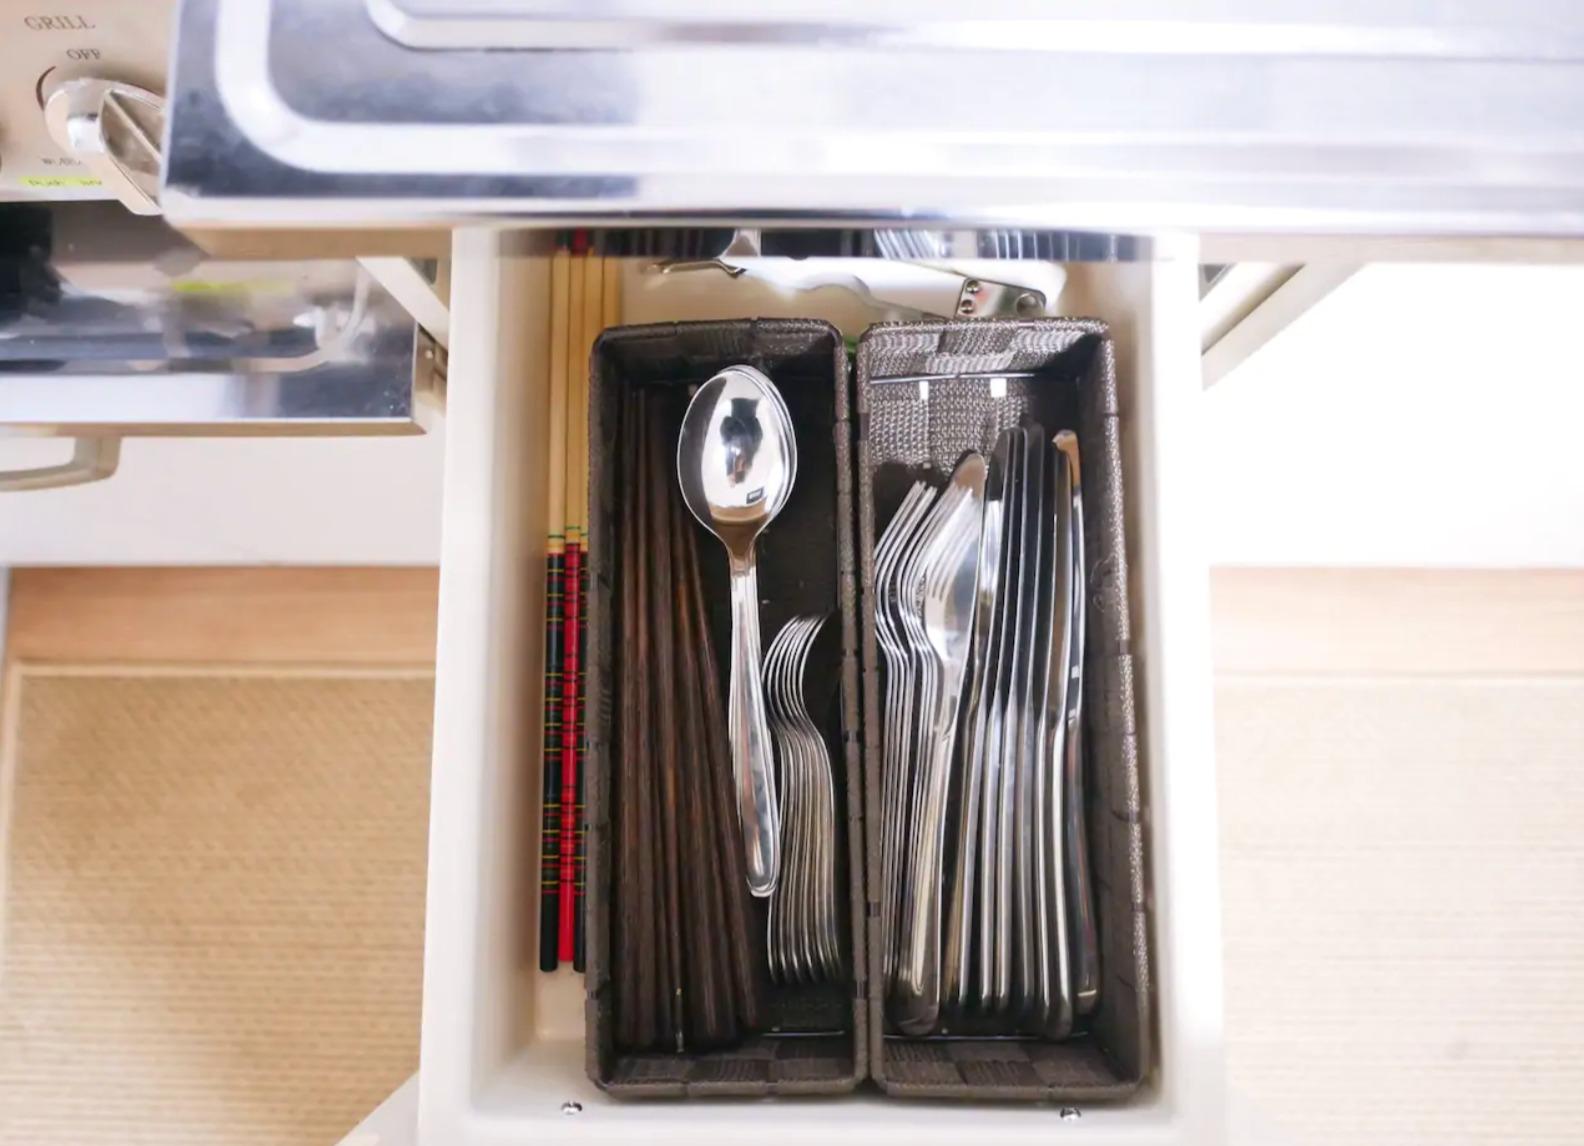 Cutlery is prepared! スプーン、フォーク、ナイフ、お箸は定員数分揃えています。